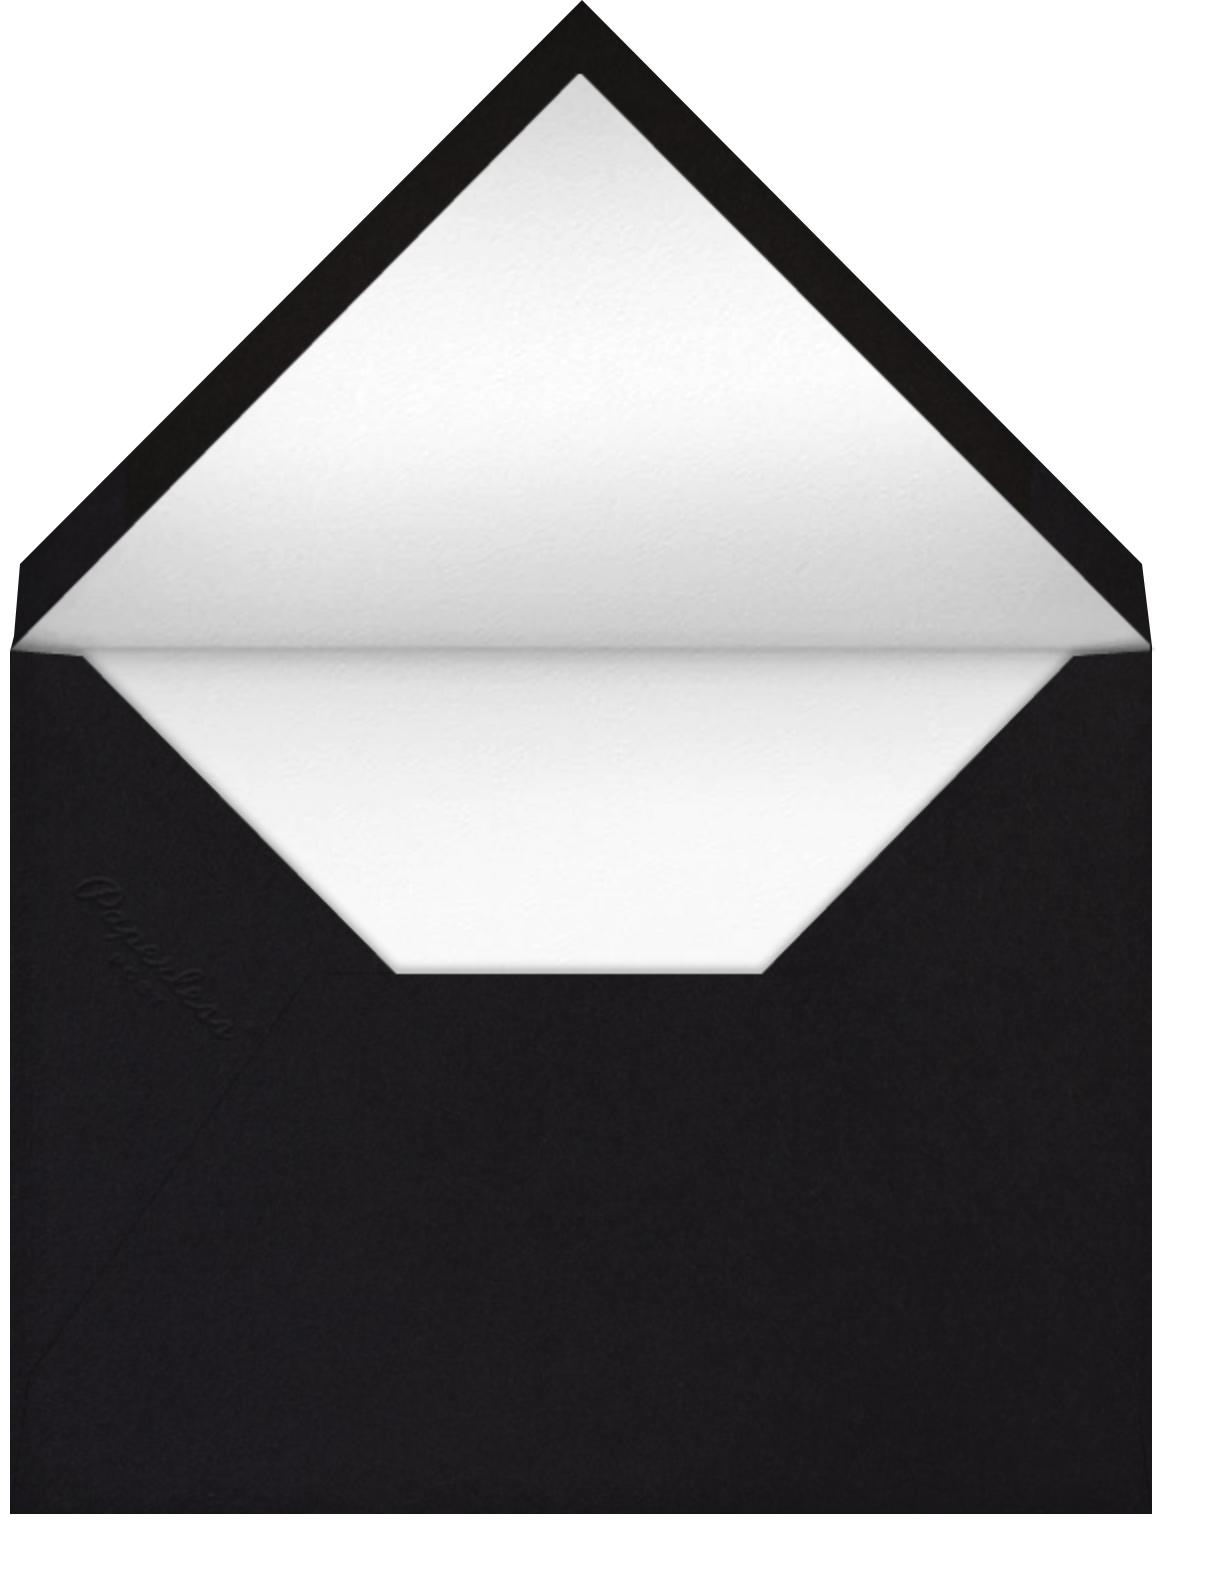 Asymmetric - Black - kate spade new york - Professional events - envelope back